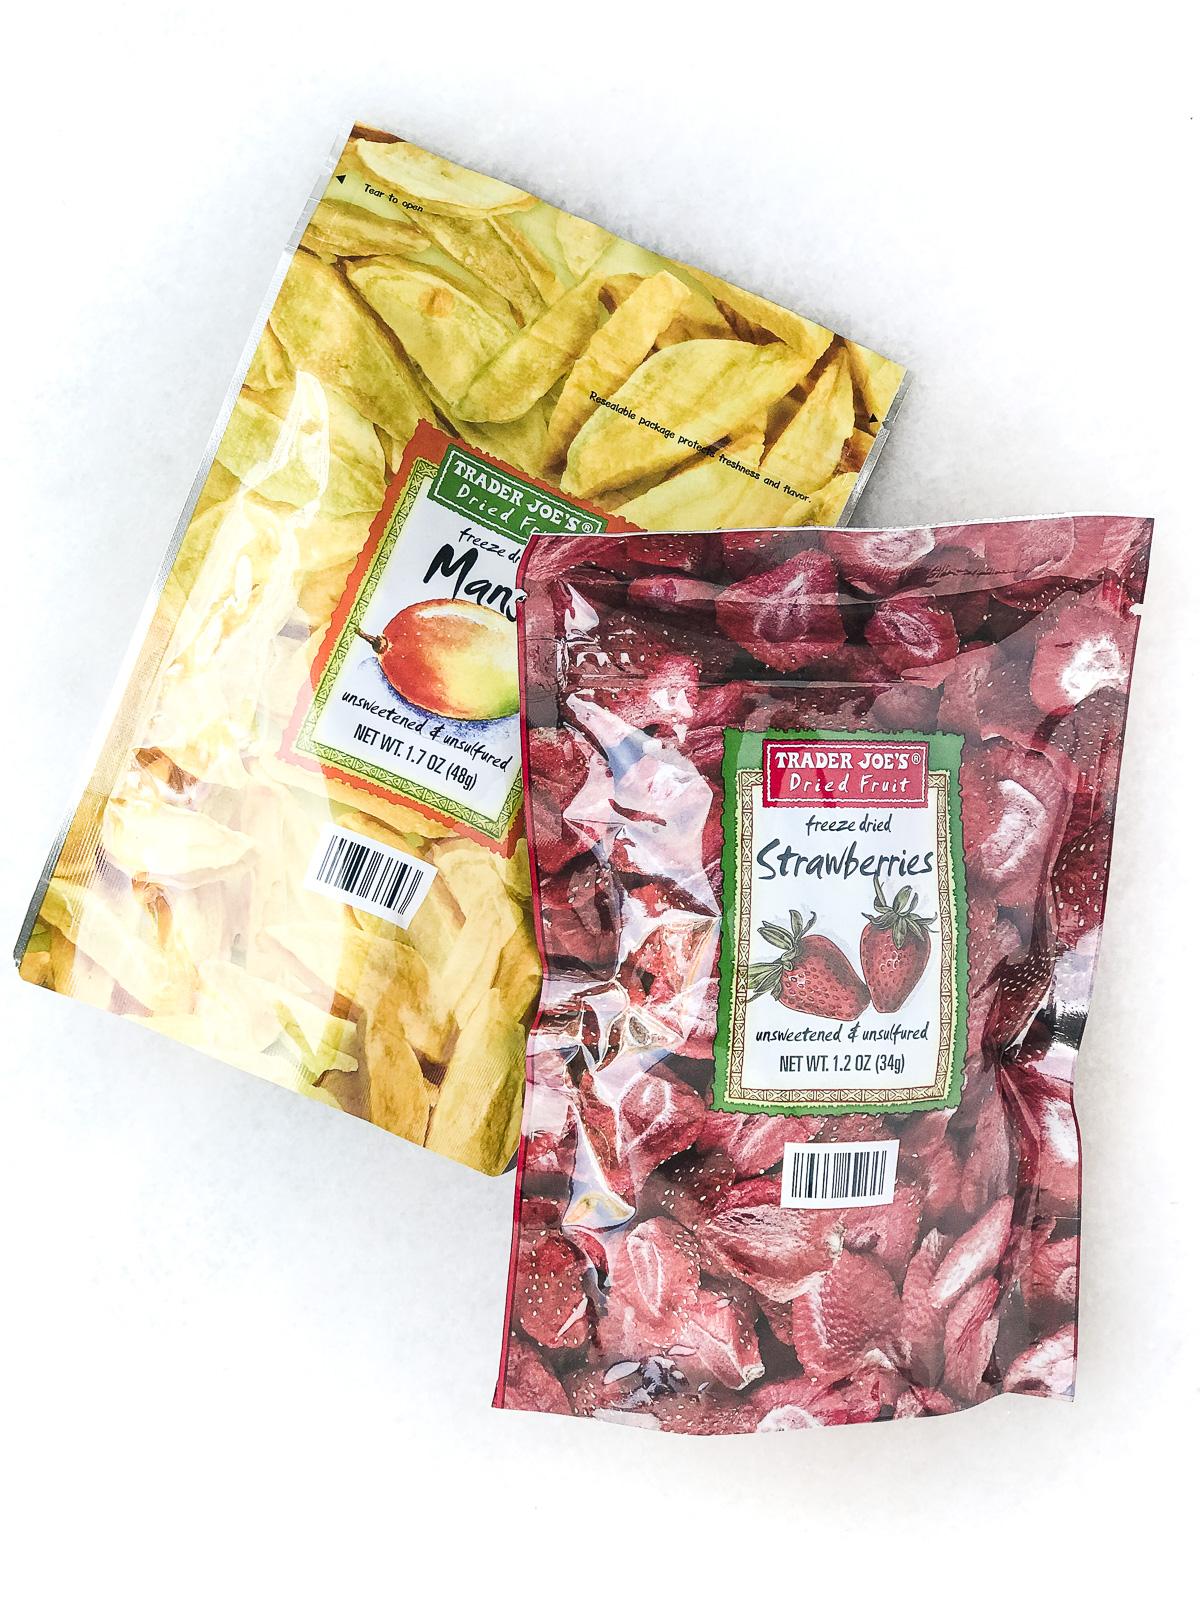 Trader Joe's freeze dried fruit